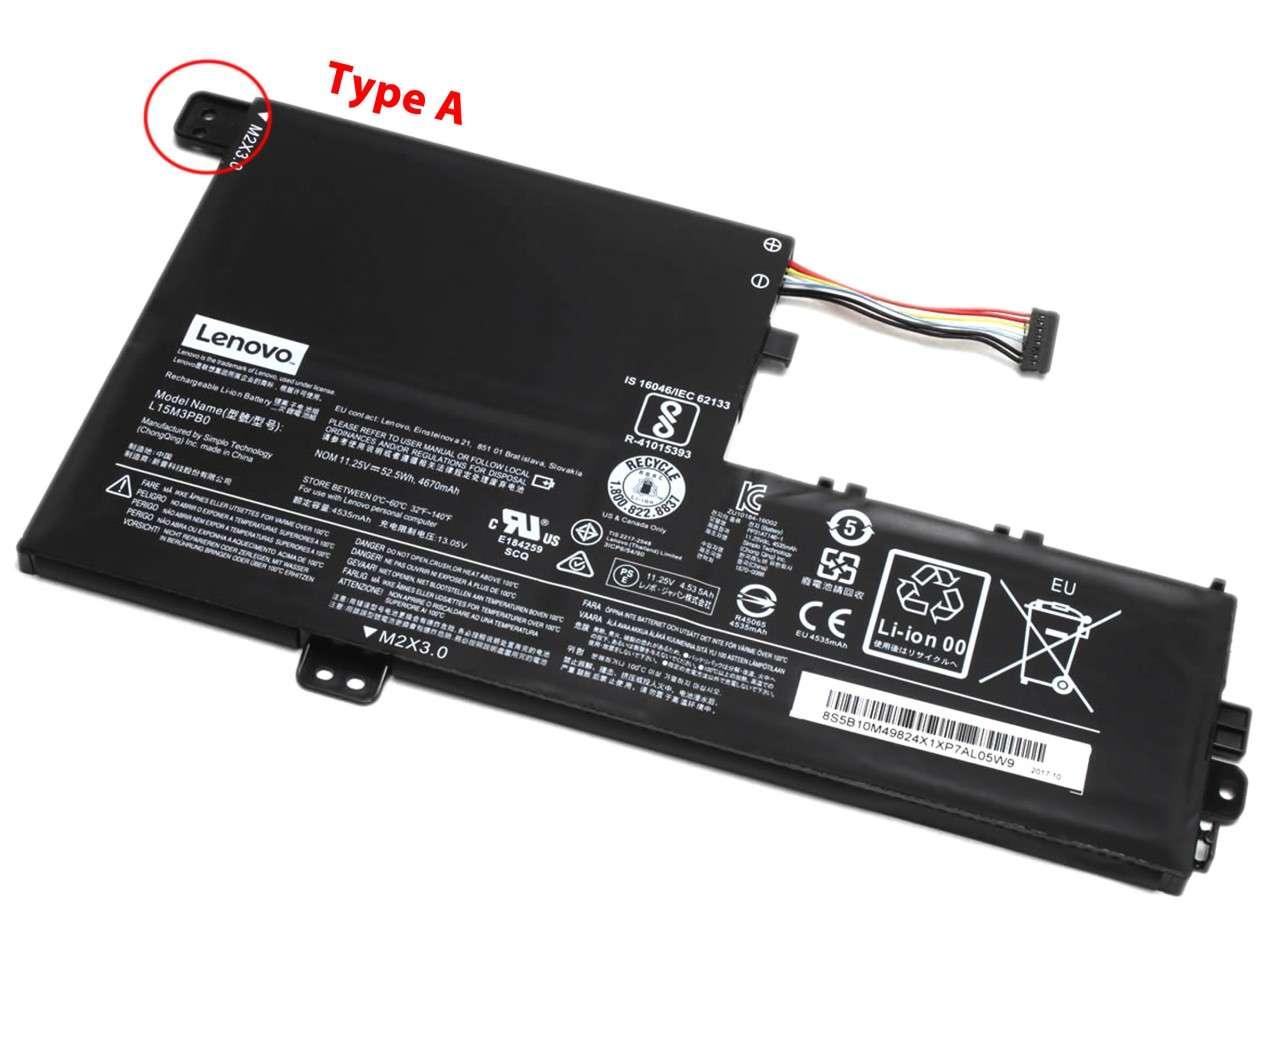 Baterie Lenovo IdeaPad FLEX 5 1570 Originala 52.5Wh Type A imagine powerlaptop.ro 2021